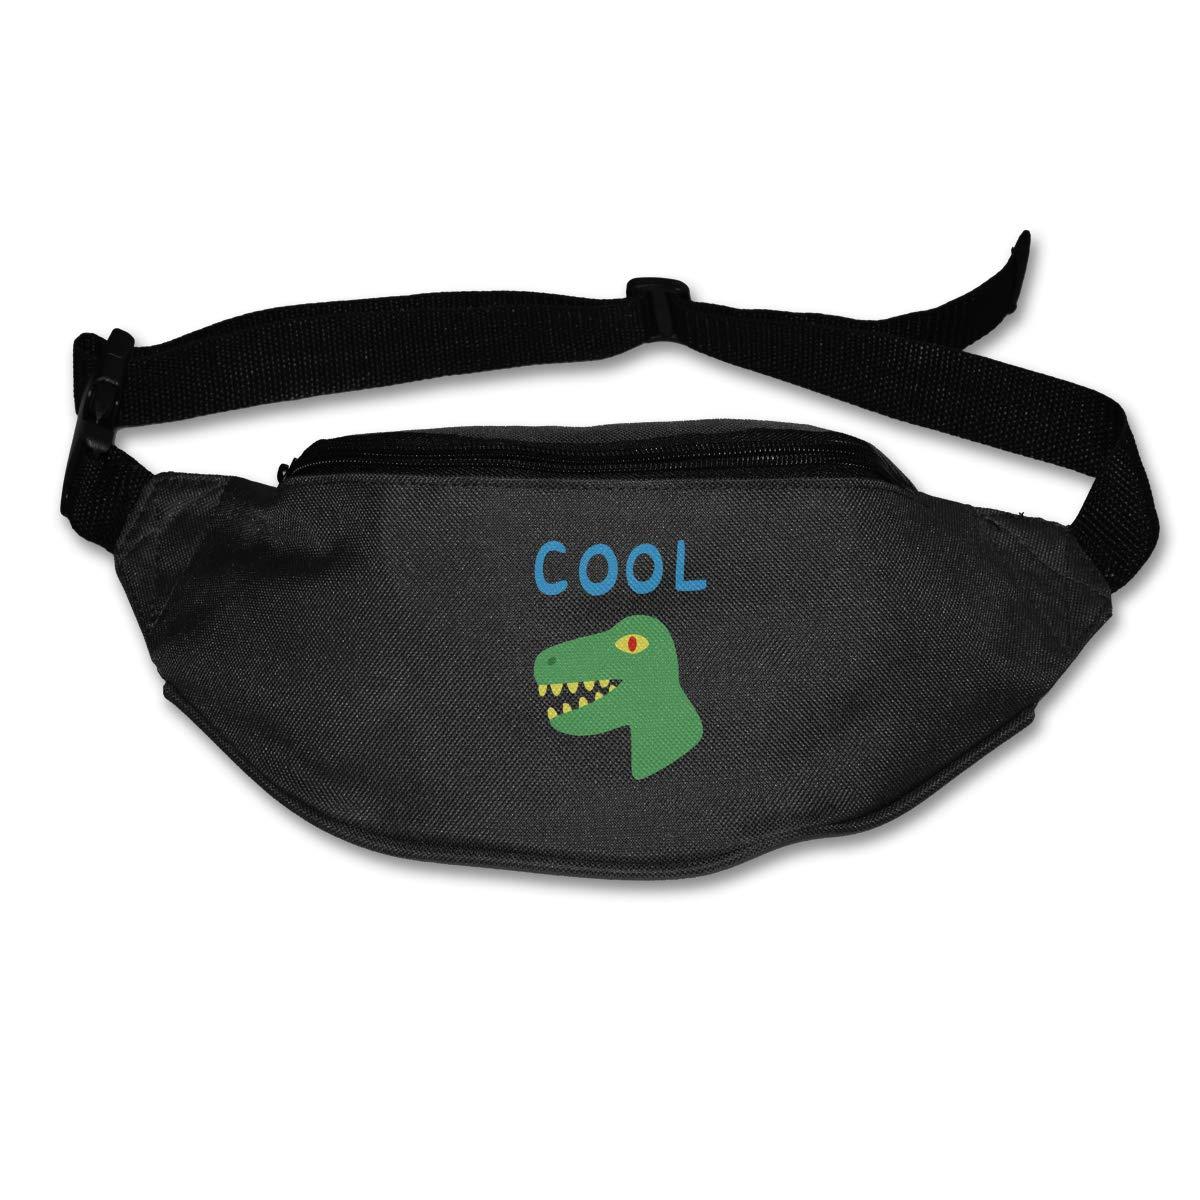 Cool Dinosaur Sport Waist Packs Fanny Pack Adjustable For Travel